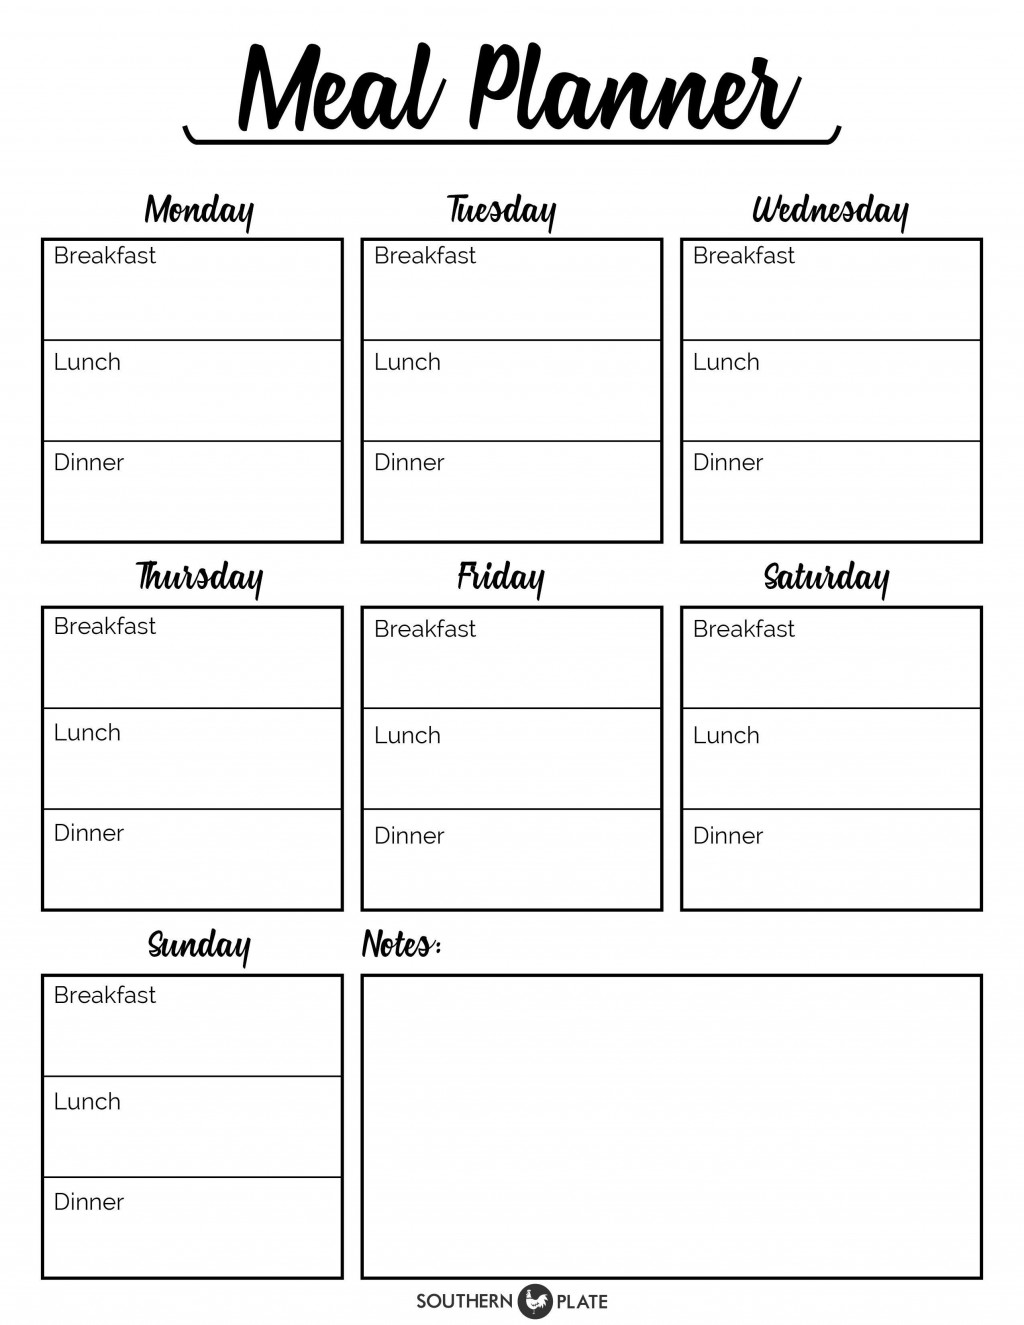 001 Incredible Meal Plan Printable Pdf Concept  Worksheet Downloadable Template SheetLarge